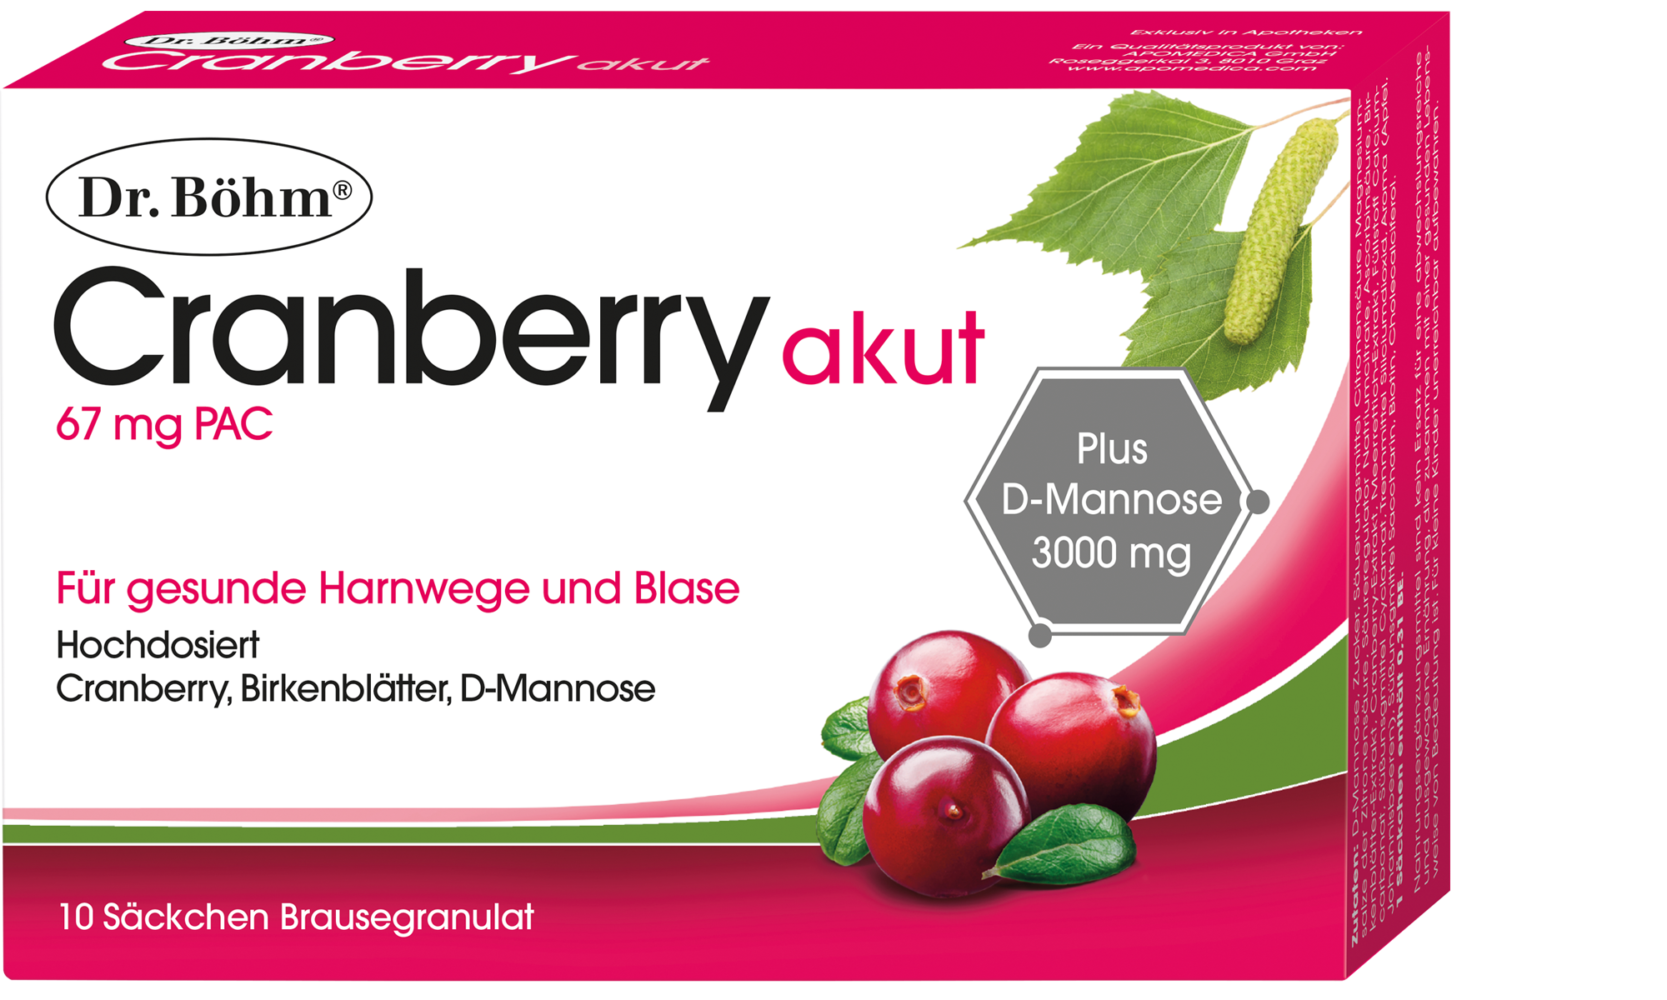 Dr. Böhm® Cranberry akut Brausegranulat